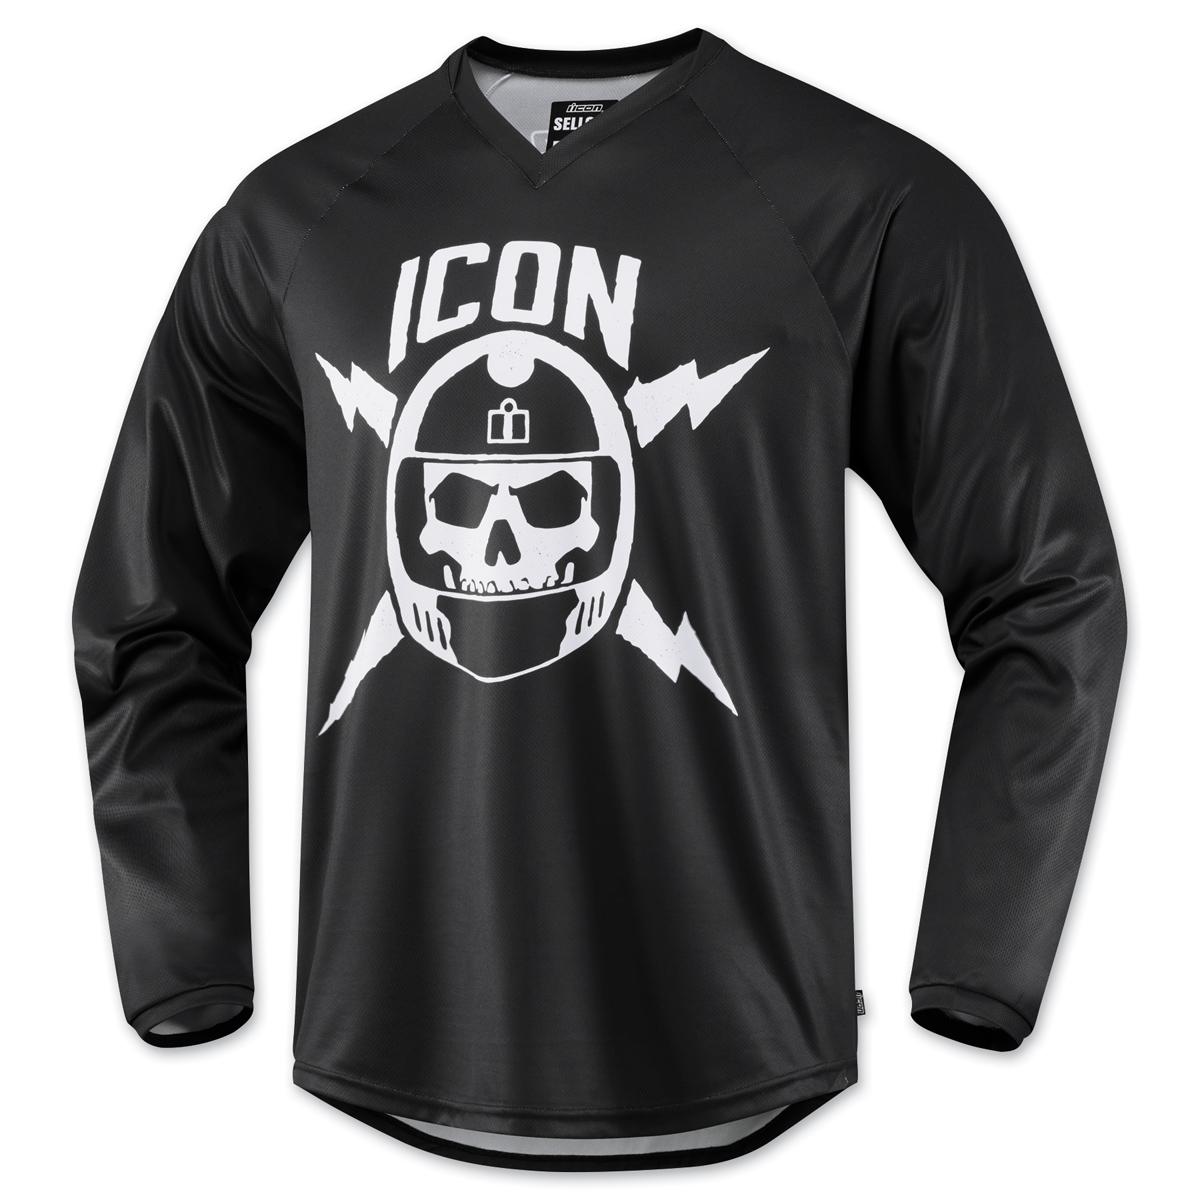 ICON Men's Sellout Black Jersey